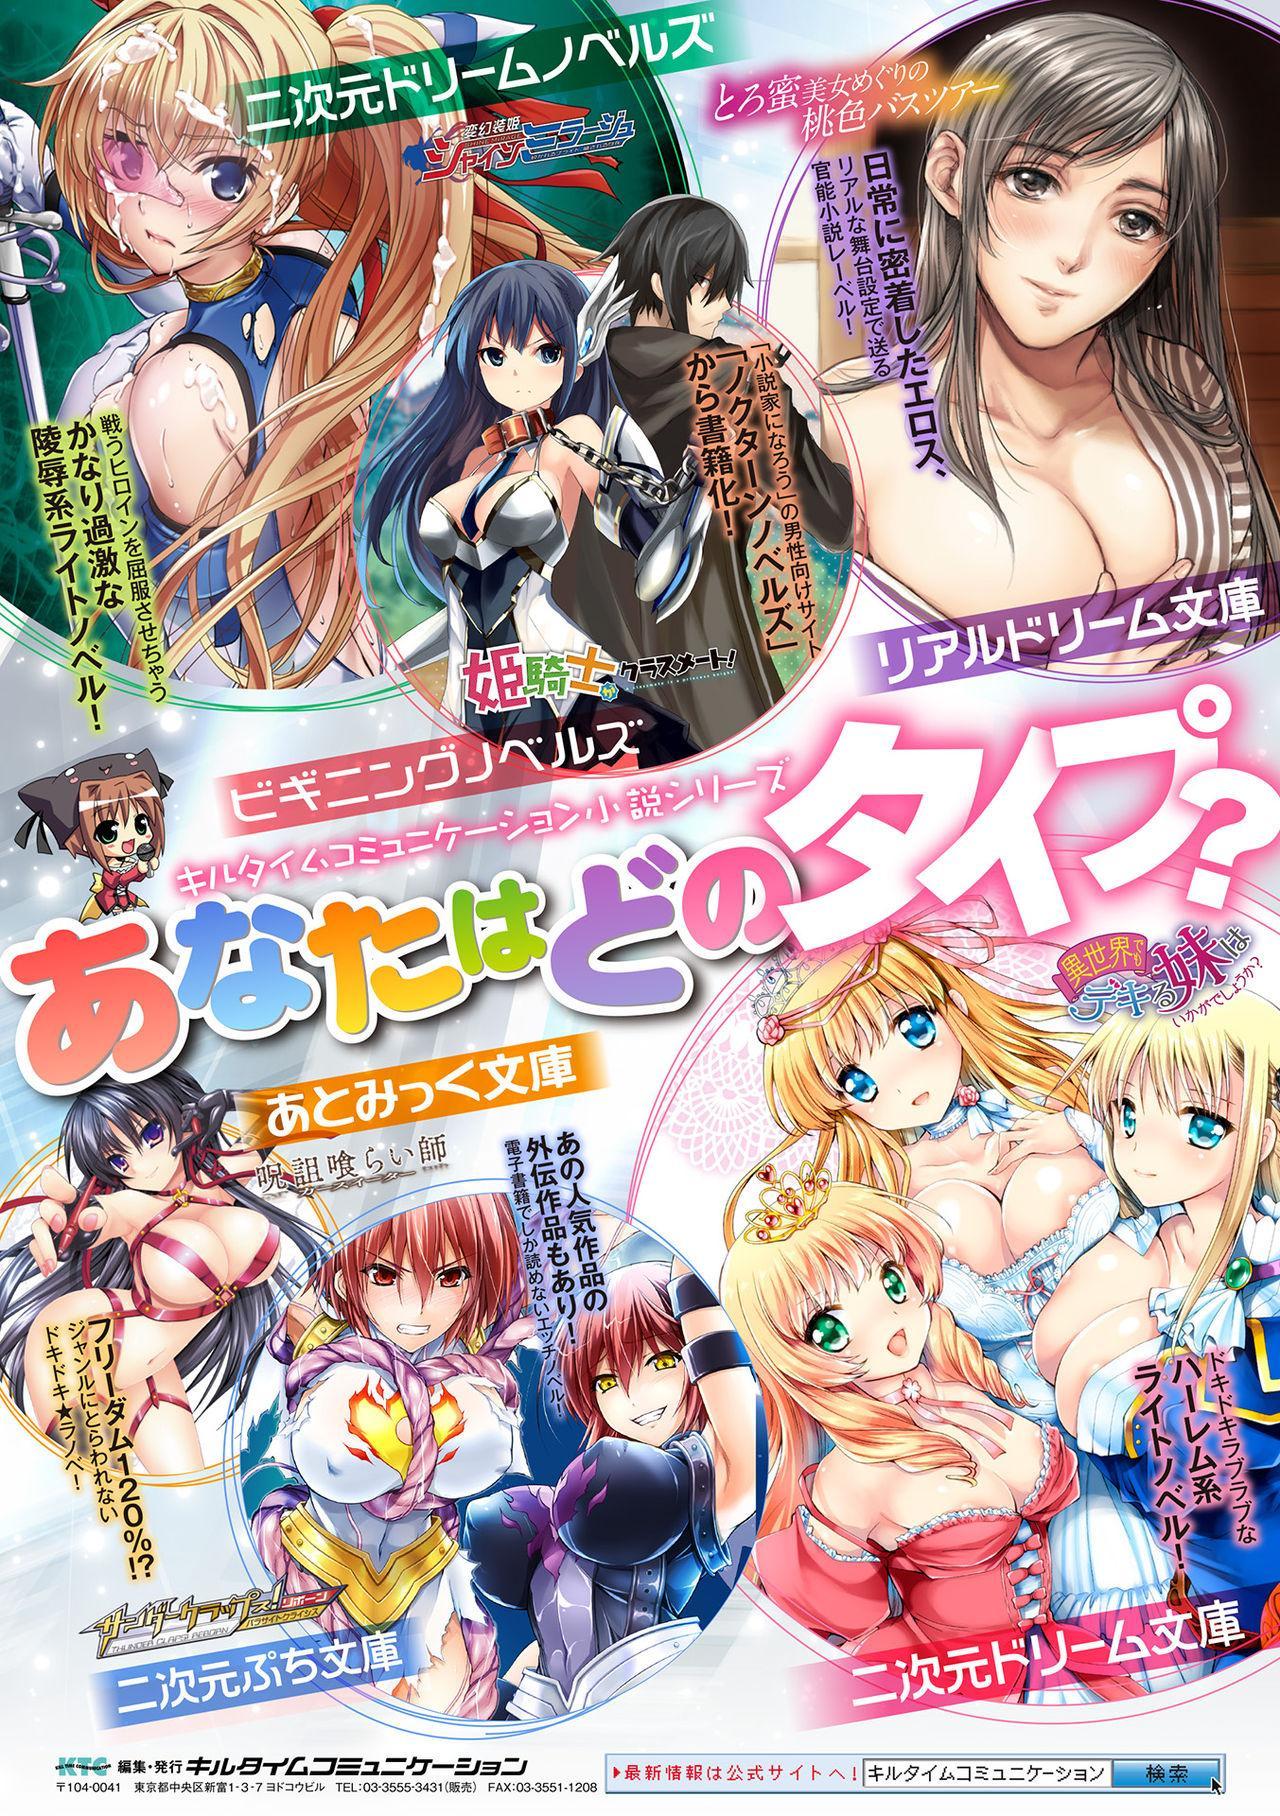 2D Comic Magazine Ero Chishiki 0 na Heroine Damashite Ryoujoku Muchix! Vol. 1 89